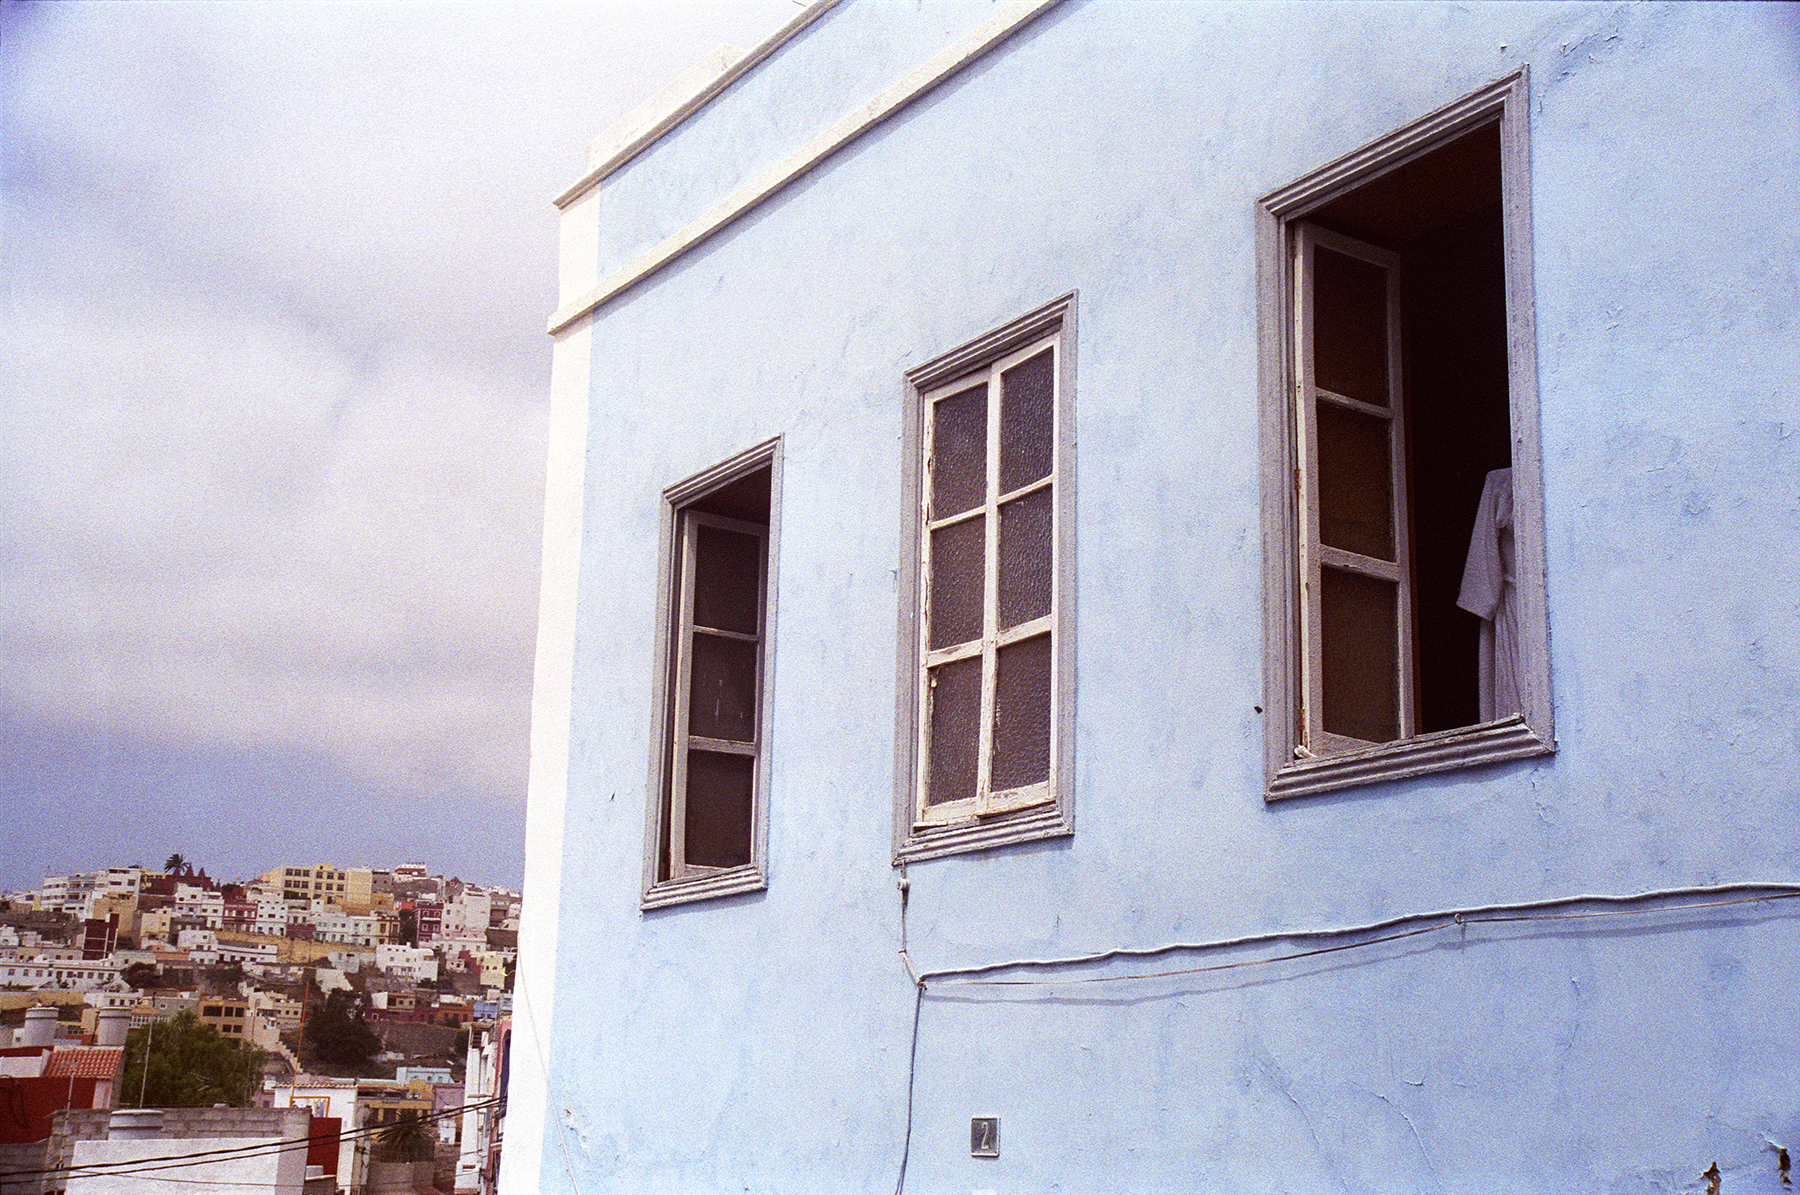 021 - JPG - Canarias Ventanas - MYNT PEQ